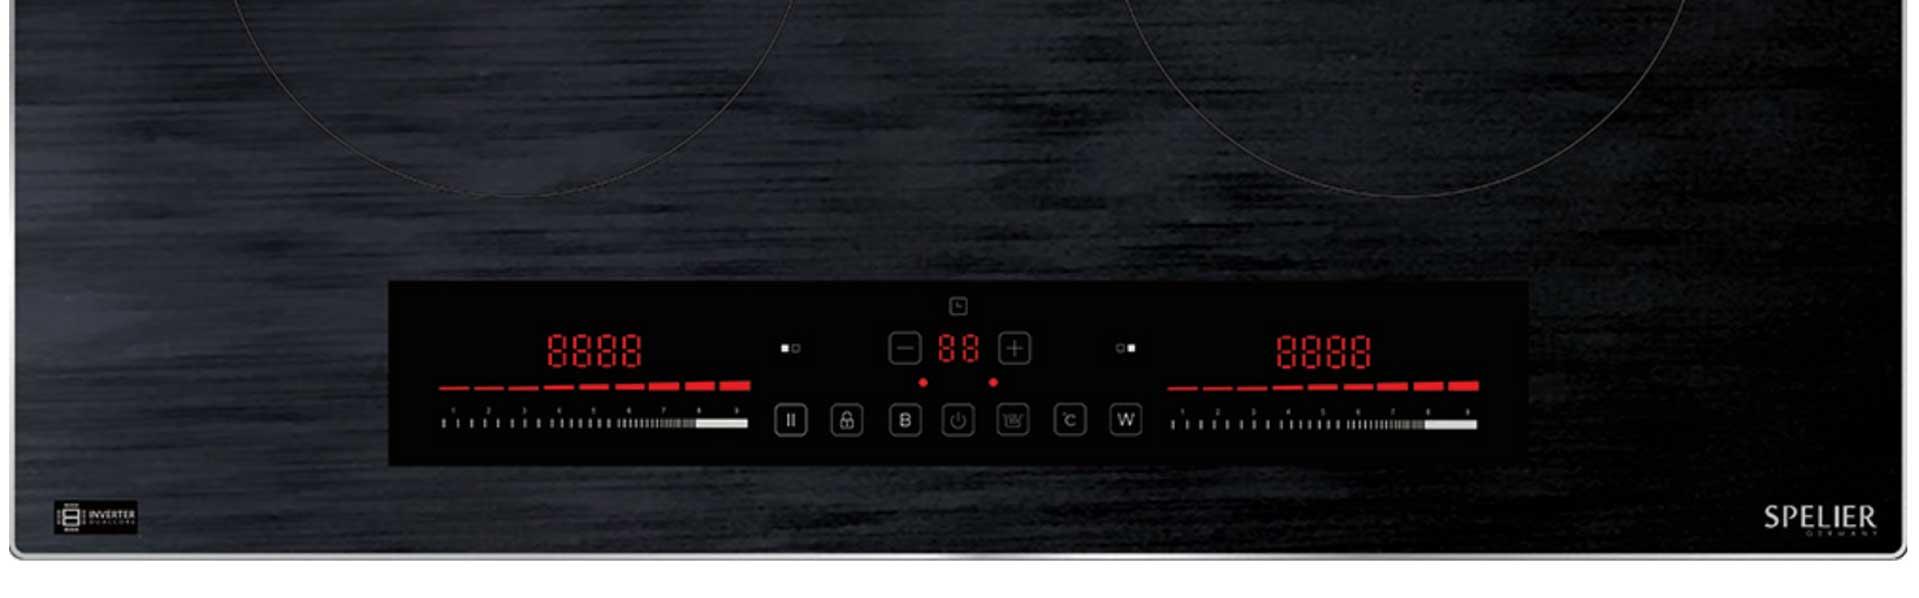 bảng điều khiển Bếp từ Spelier SPM-T71KS